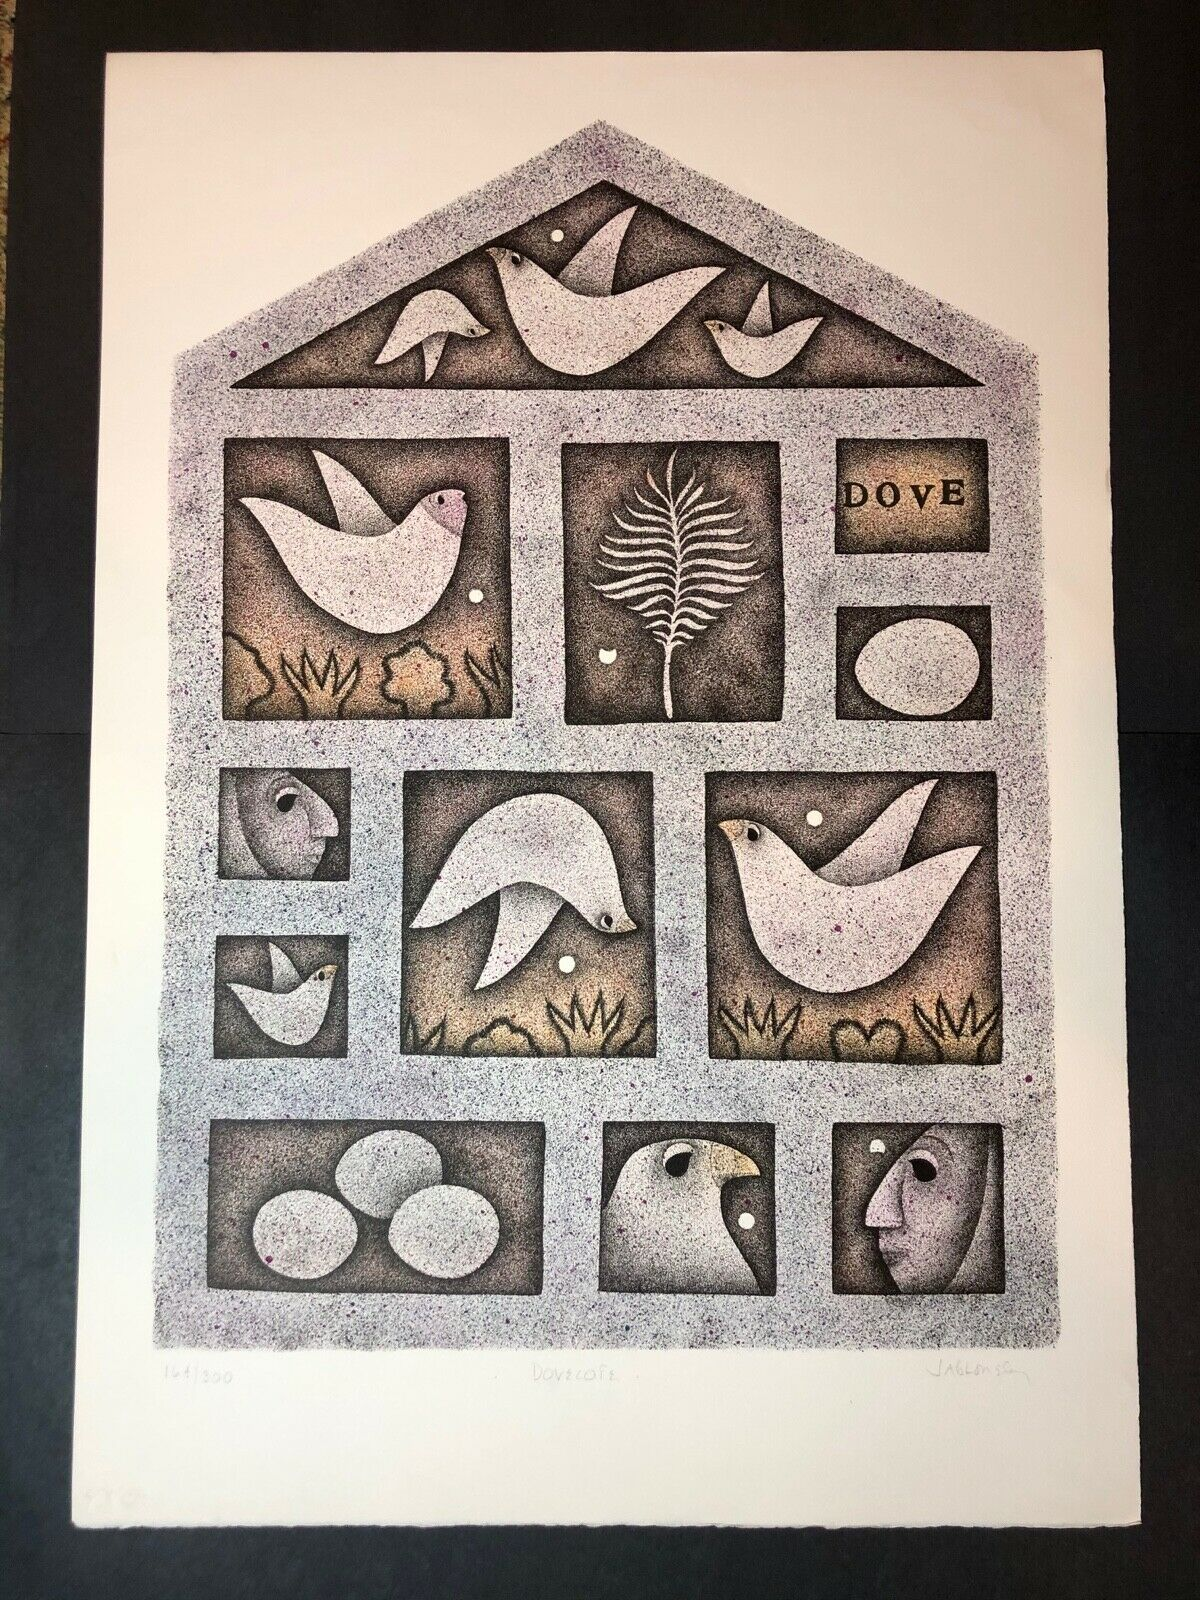 Carol Jablonsky Lithograph Art Print – Dovecote Limited Edition 164/300 Art